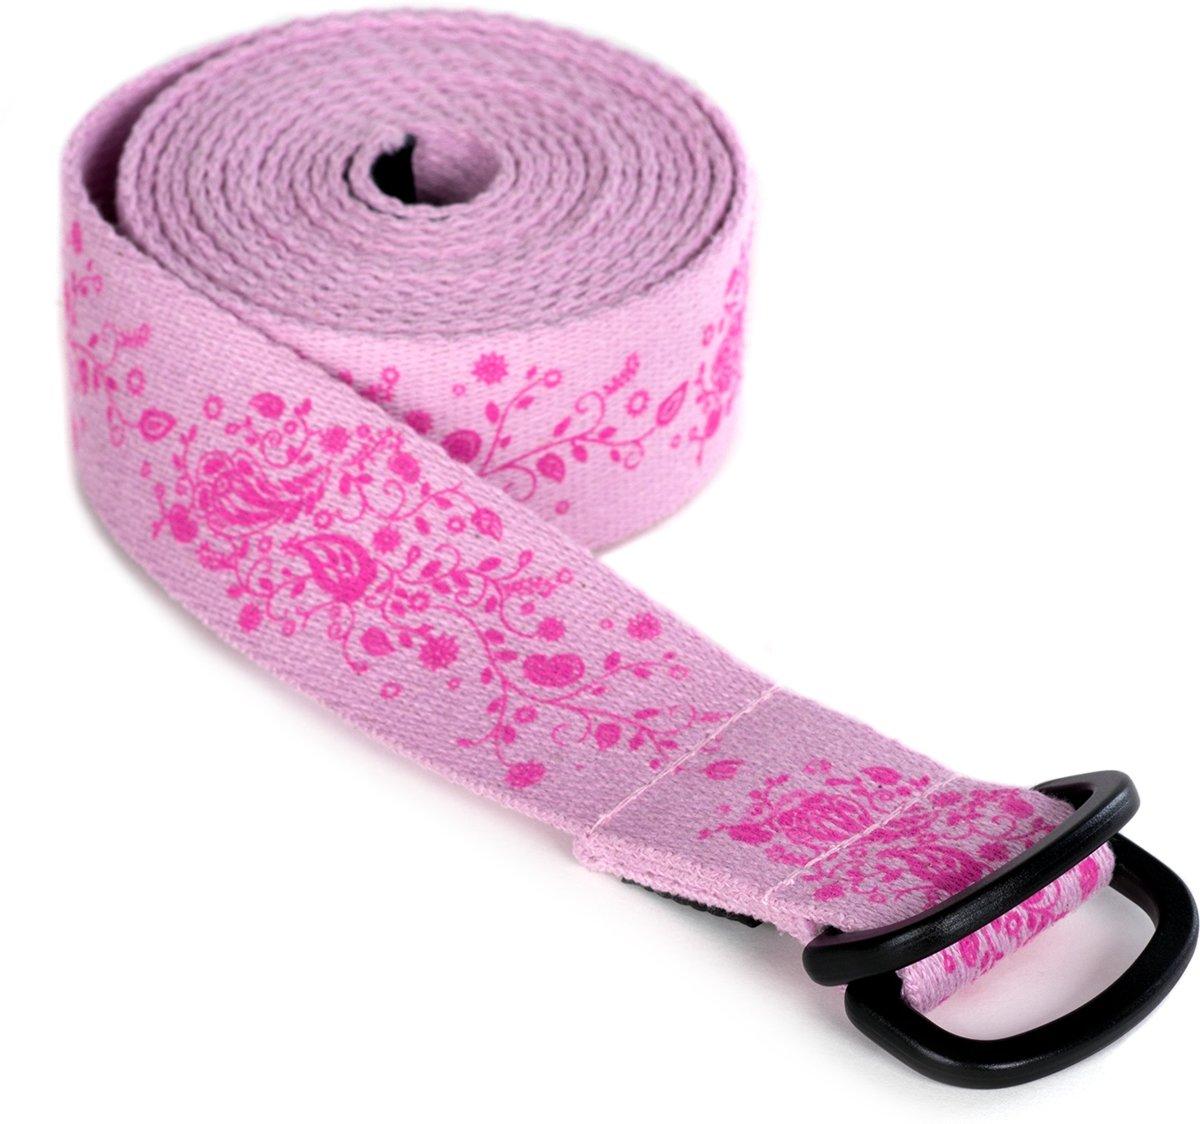 Yoga riem yogibelt indian flower, Pd-ring - roze Yoga riem YOGISTAR kopen